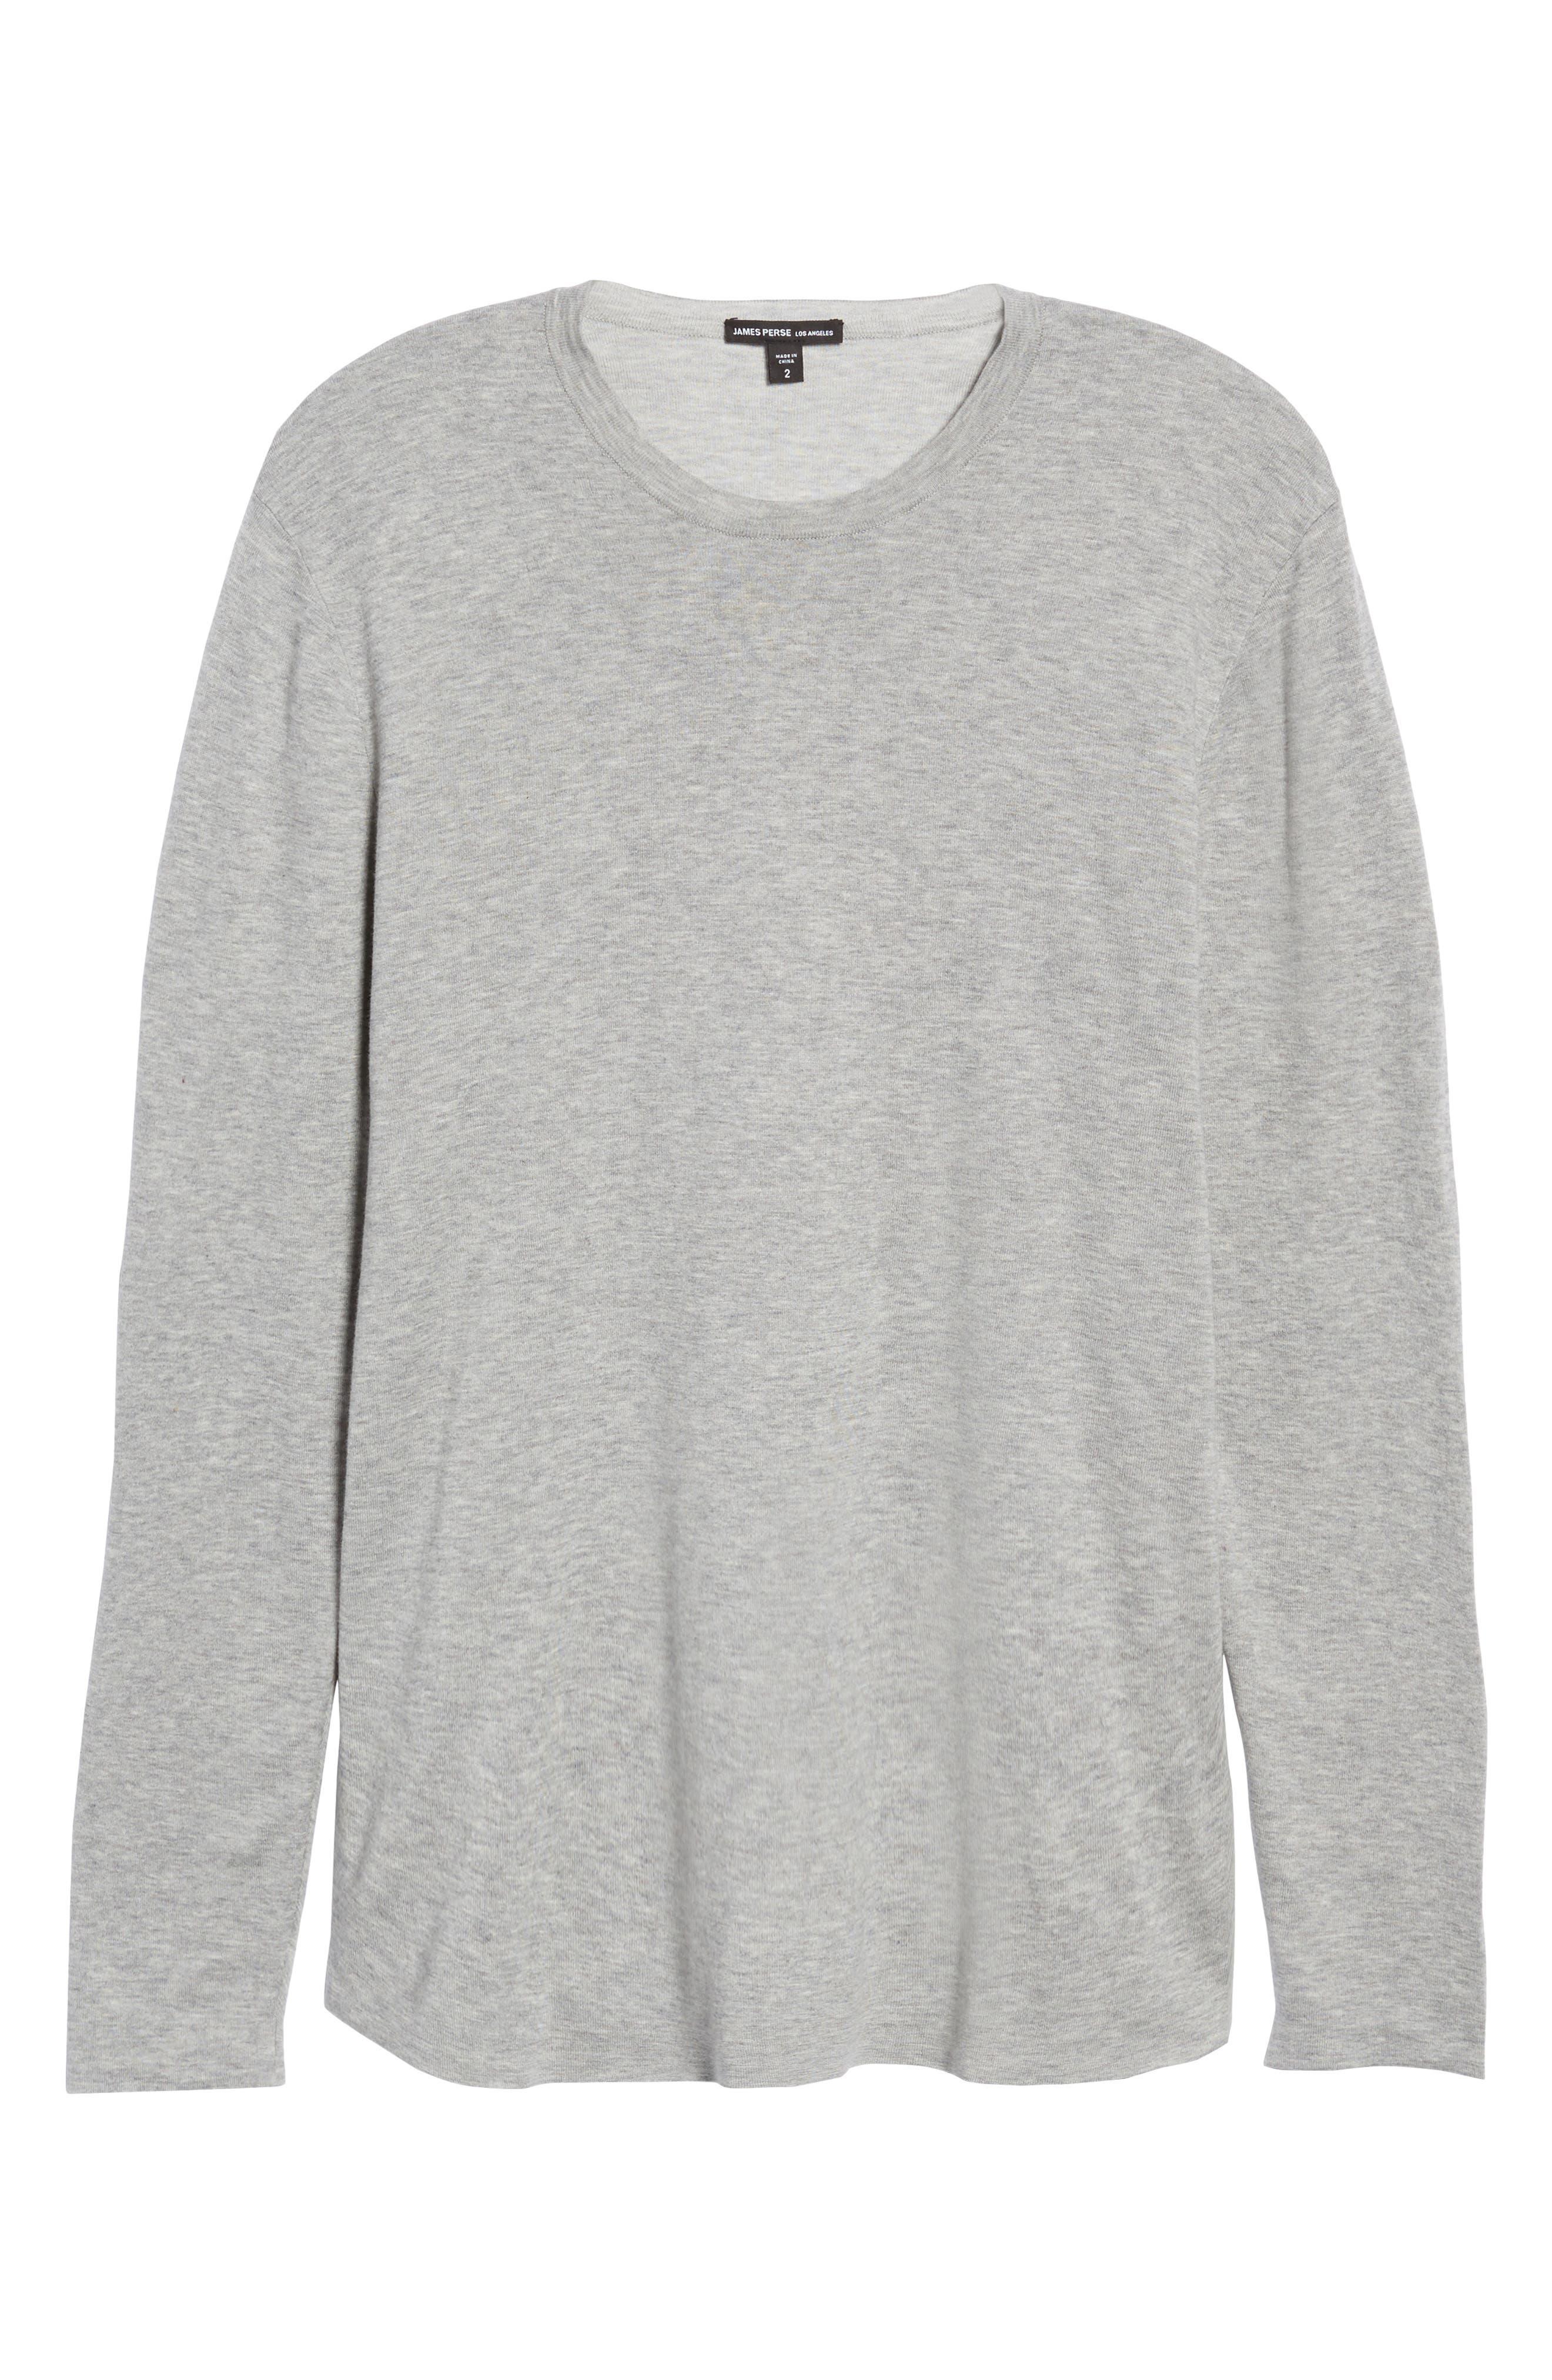 Reversible Long Sleeve T-Shirt,                             Alternate thumbnail 6, color,                             020